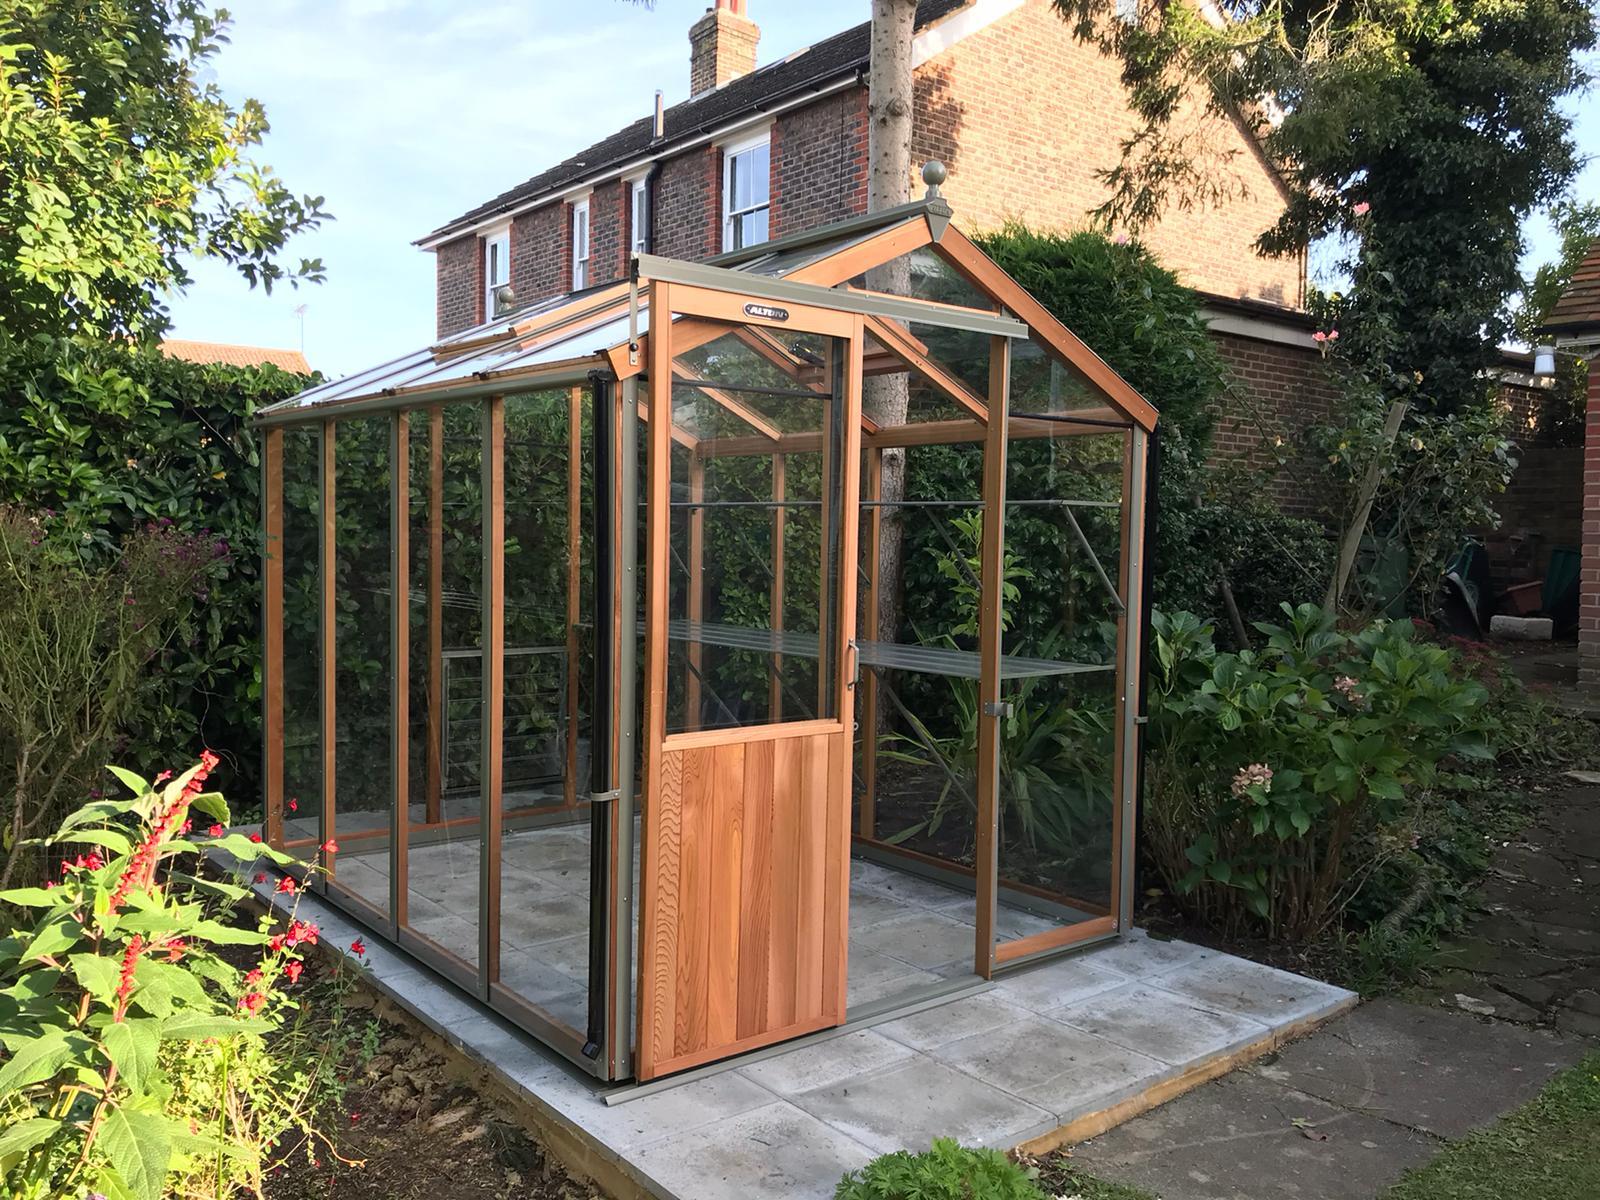 8ft x 6ft Alton Greenhouse Installation - Magson